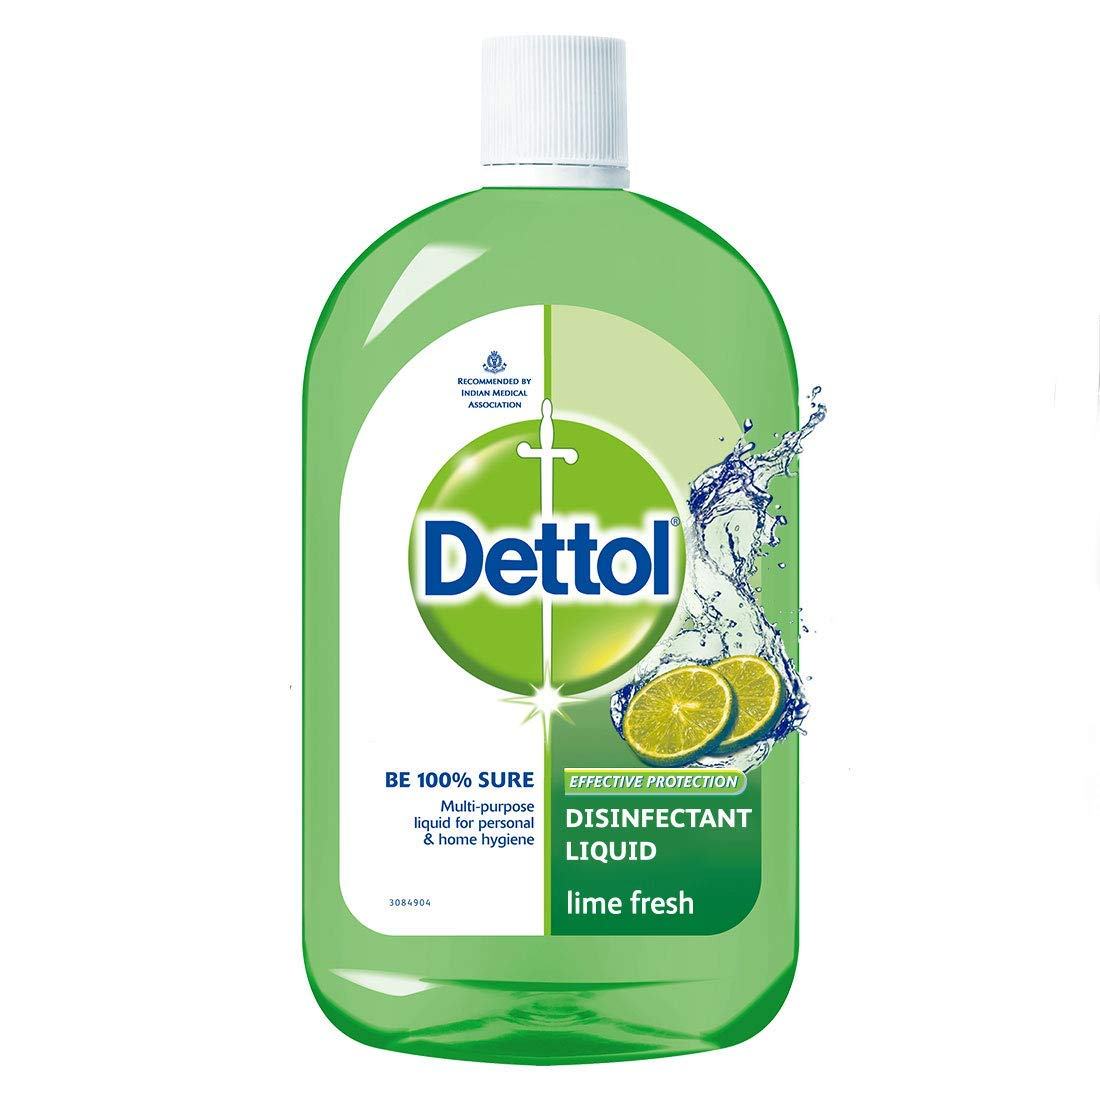 [Pantry] Dettol Liquid Disinfectant Cleaner for Home, Lime Fresh, 500ml